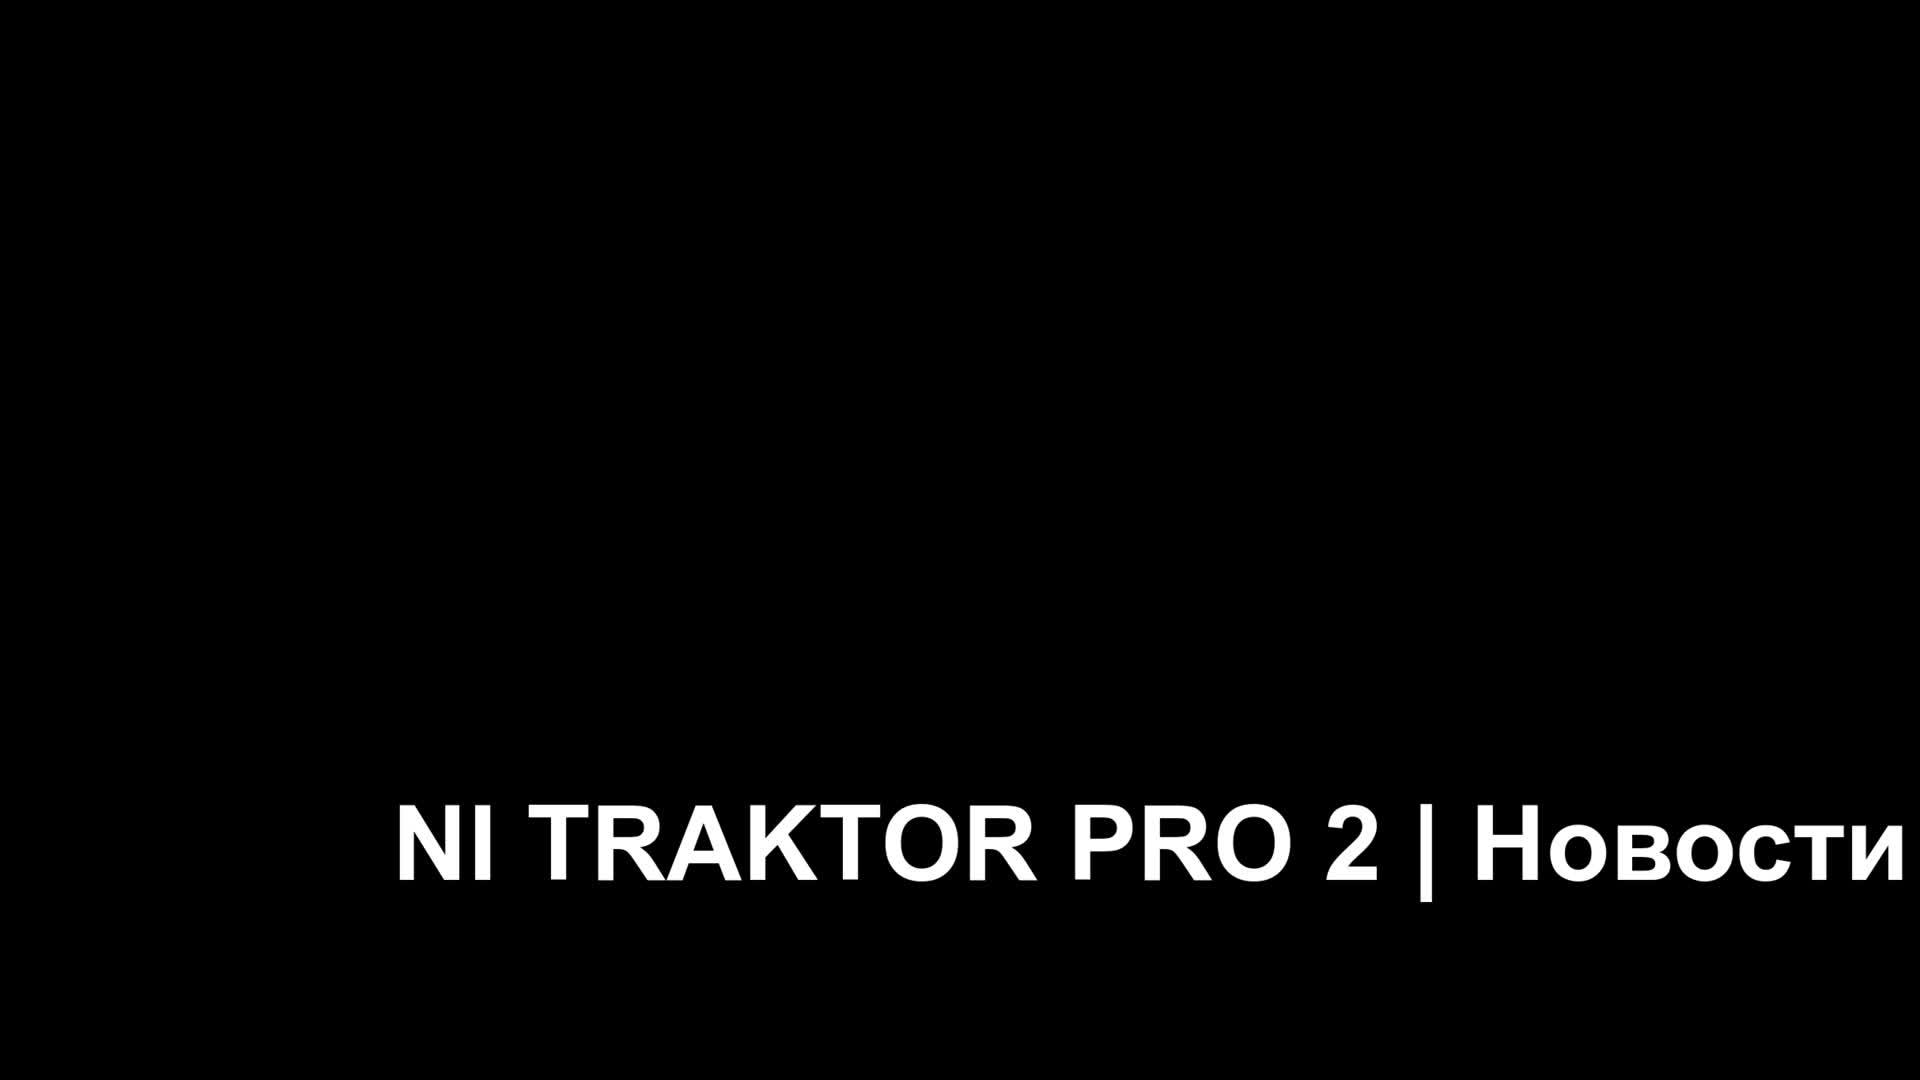 DJ Software, Dj controller, Dj equipment, Traktor, Traktor Club, Traktor DJ, Traktor DJ Software, Traktor DJs, Traktor controller, how to DJ, Introducing the New TRAKTOR KONTROL S4 – For the Music in You | Native Instruments GIFs